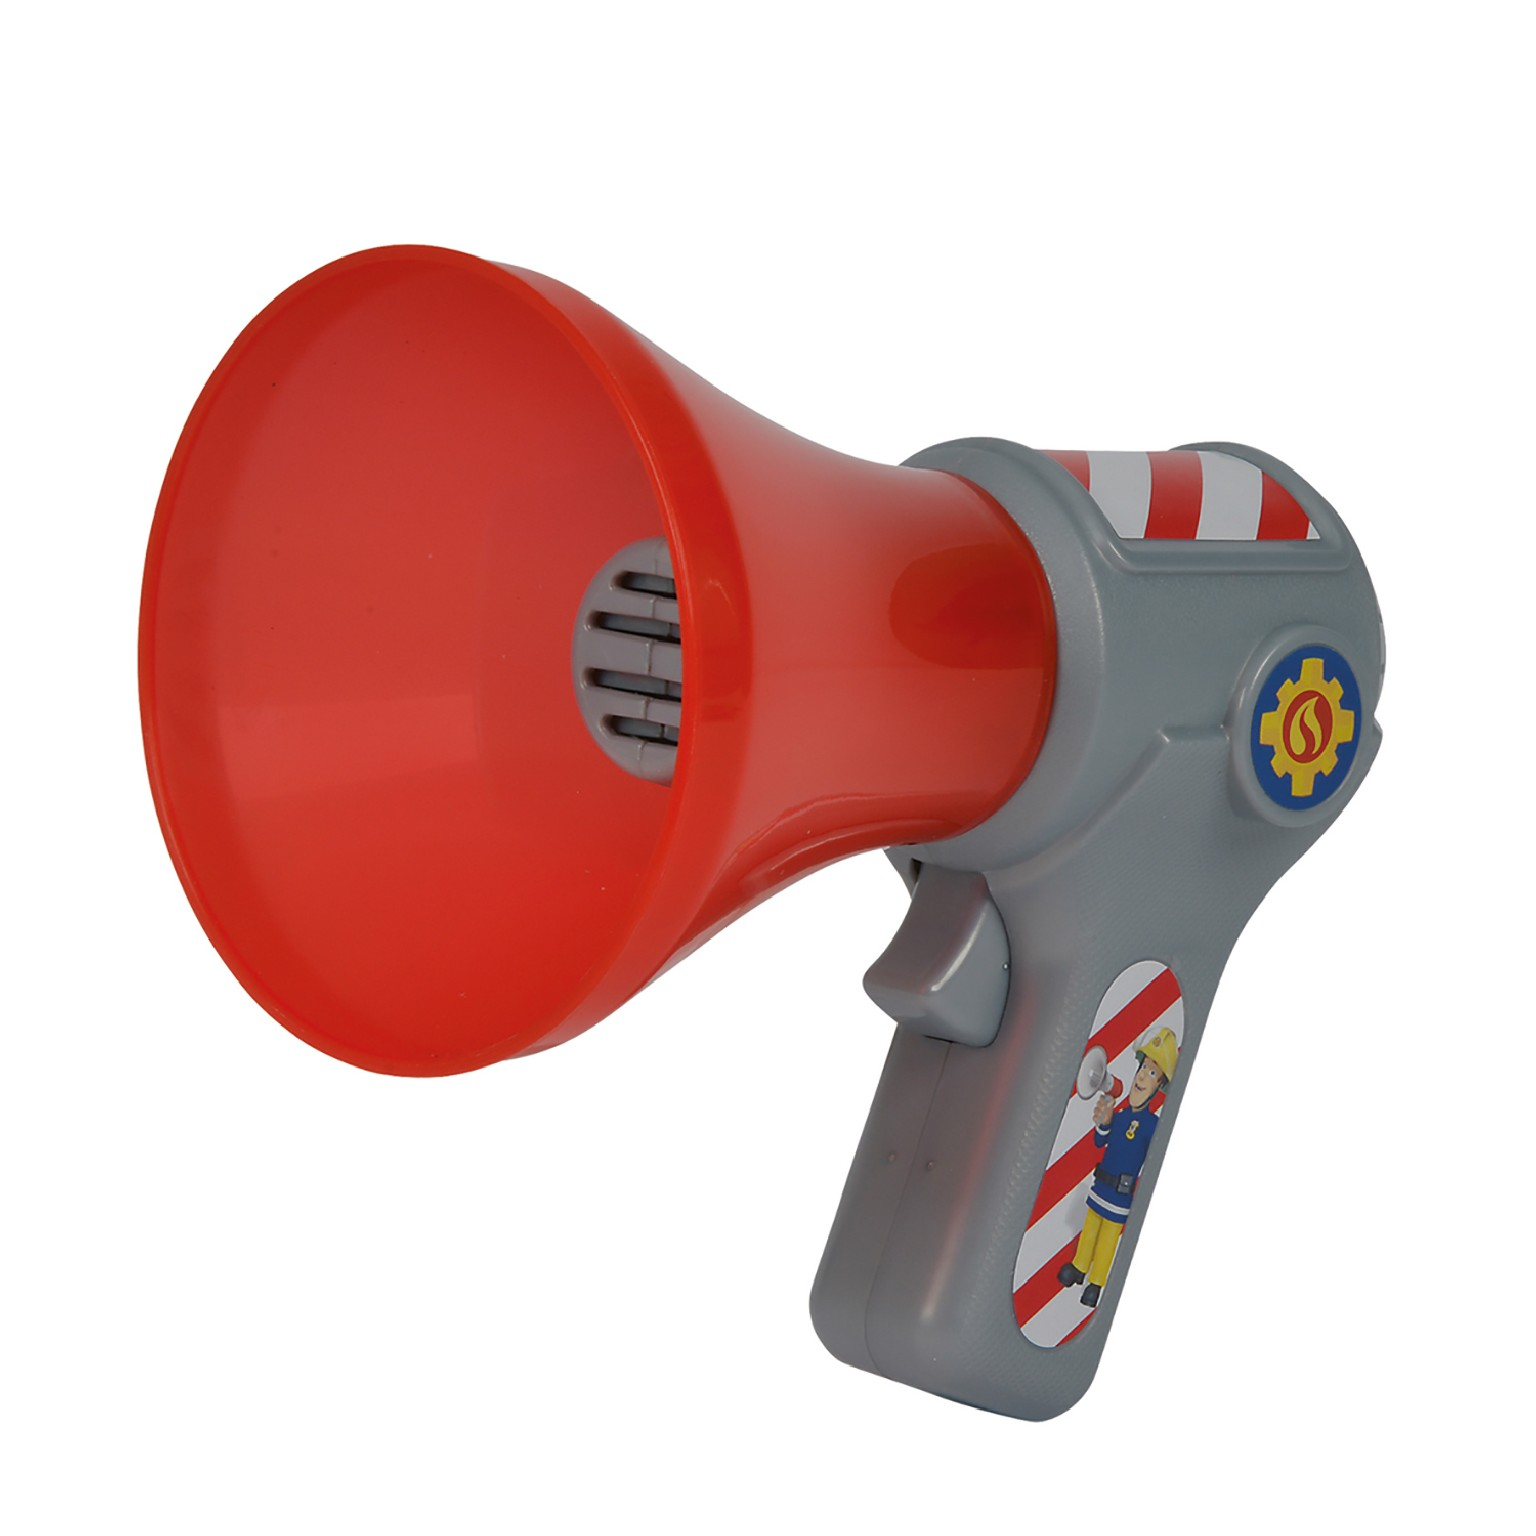 Požárník Sam megafon